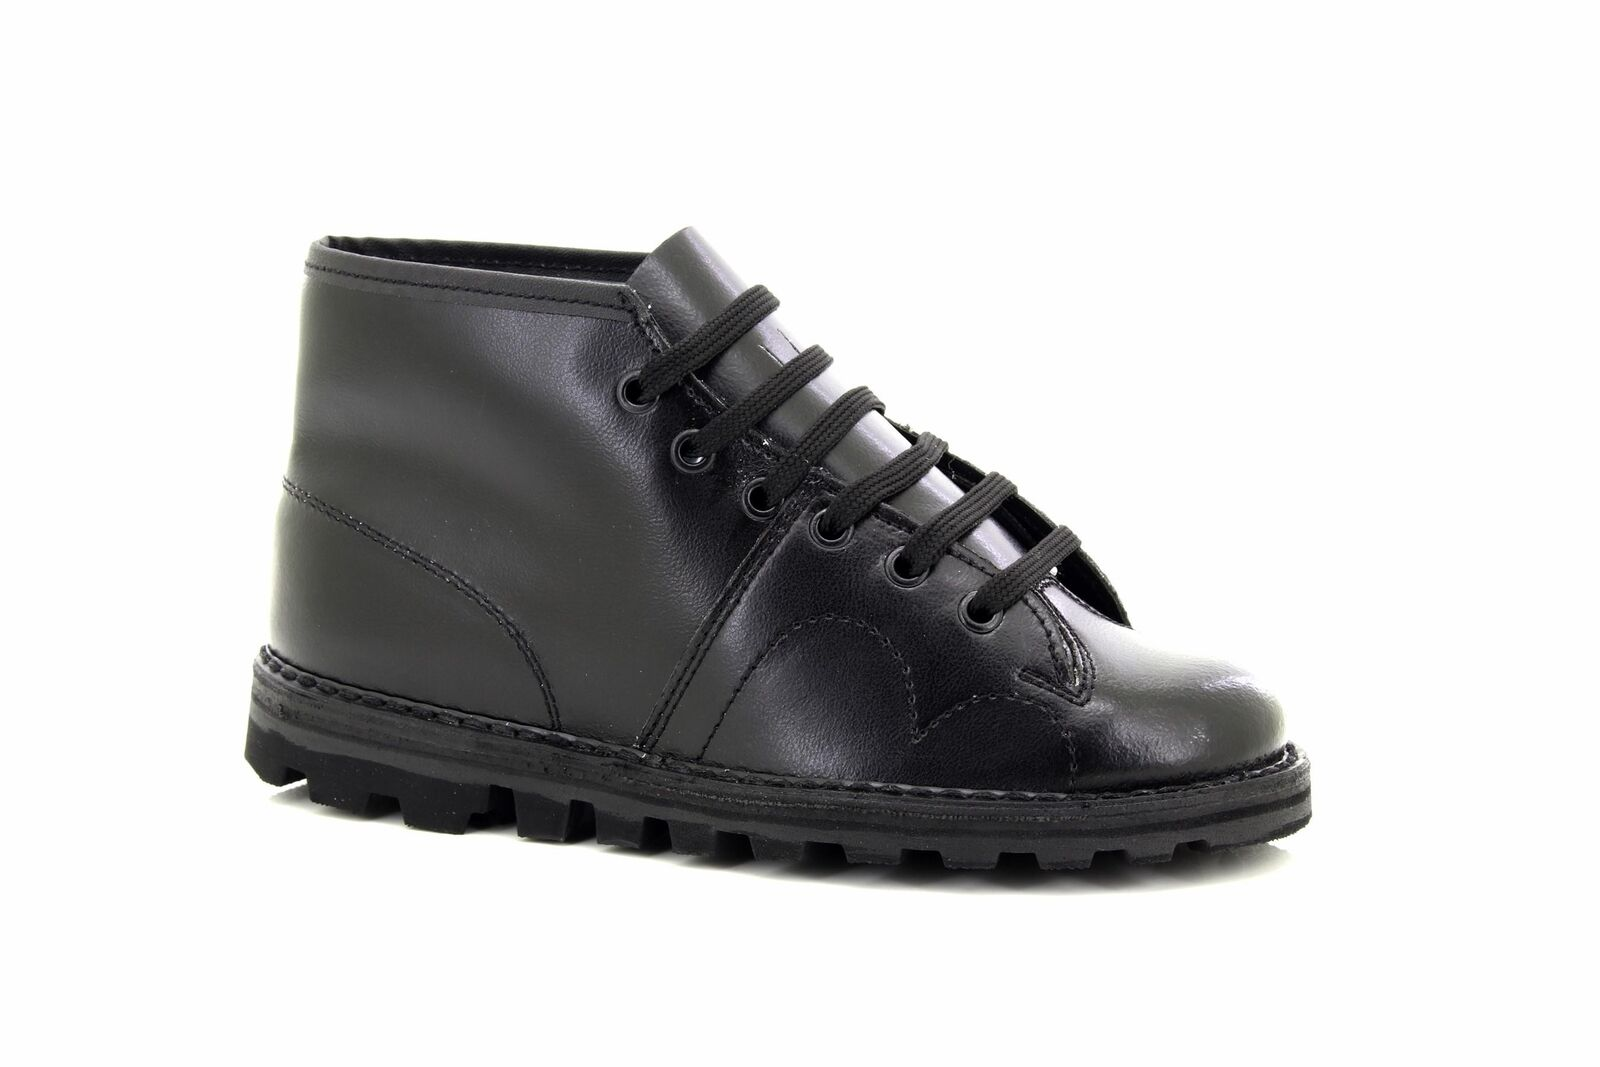 Grafters Unisex Original Retro Encaje Mono botas Años 1960 Negro Estilo